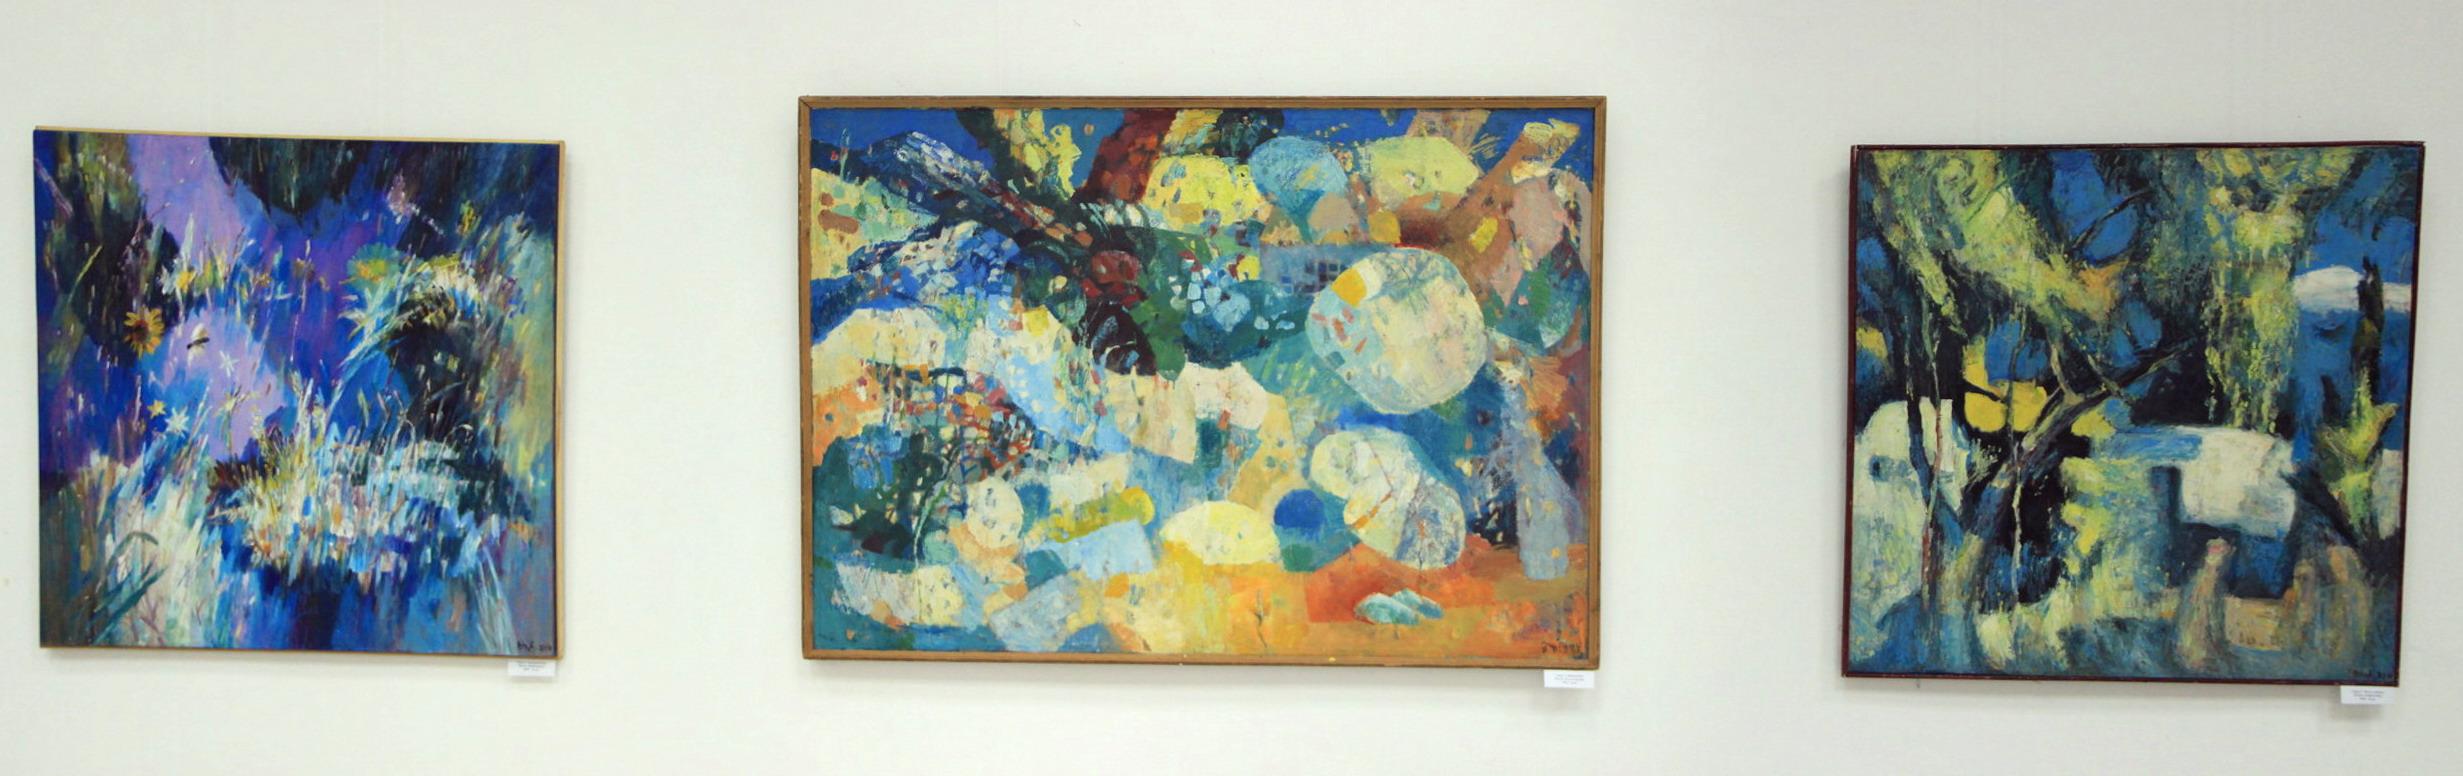 Экспозиция картин Чуб Владимира